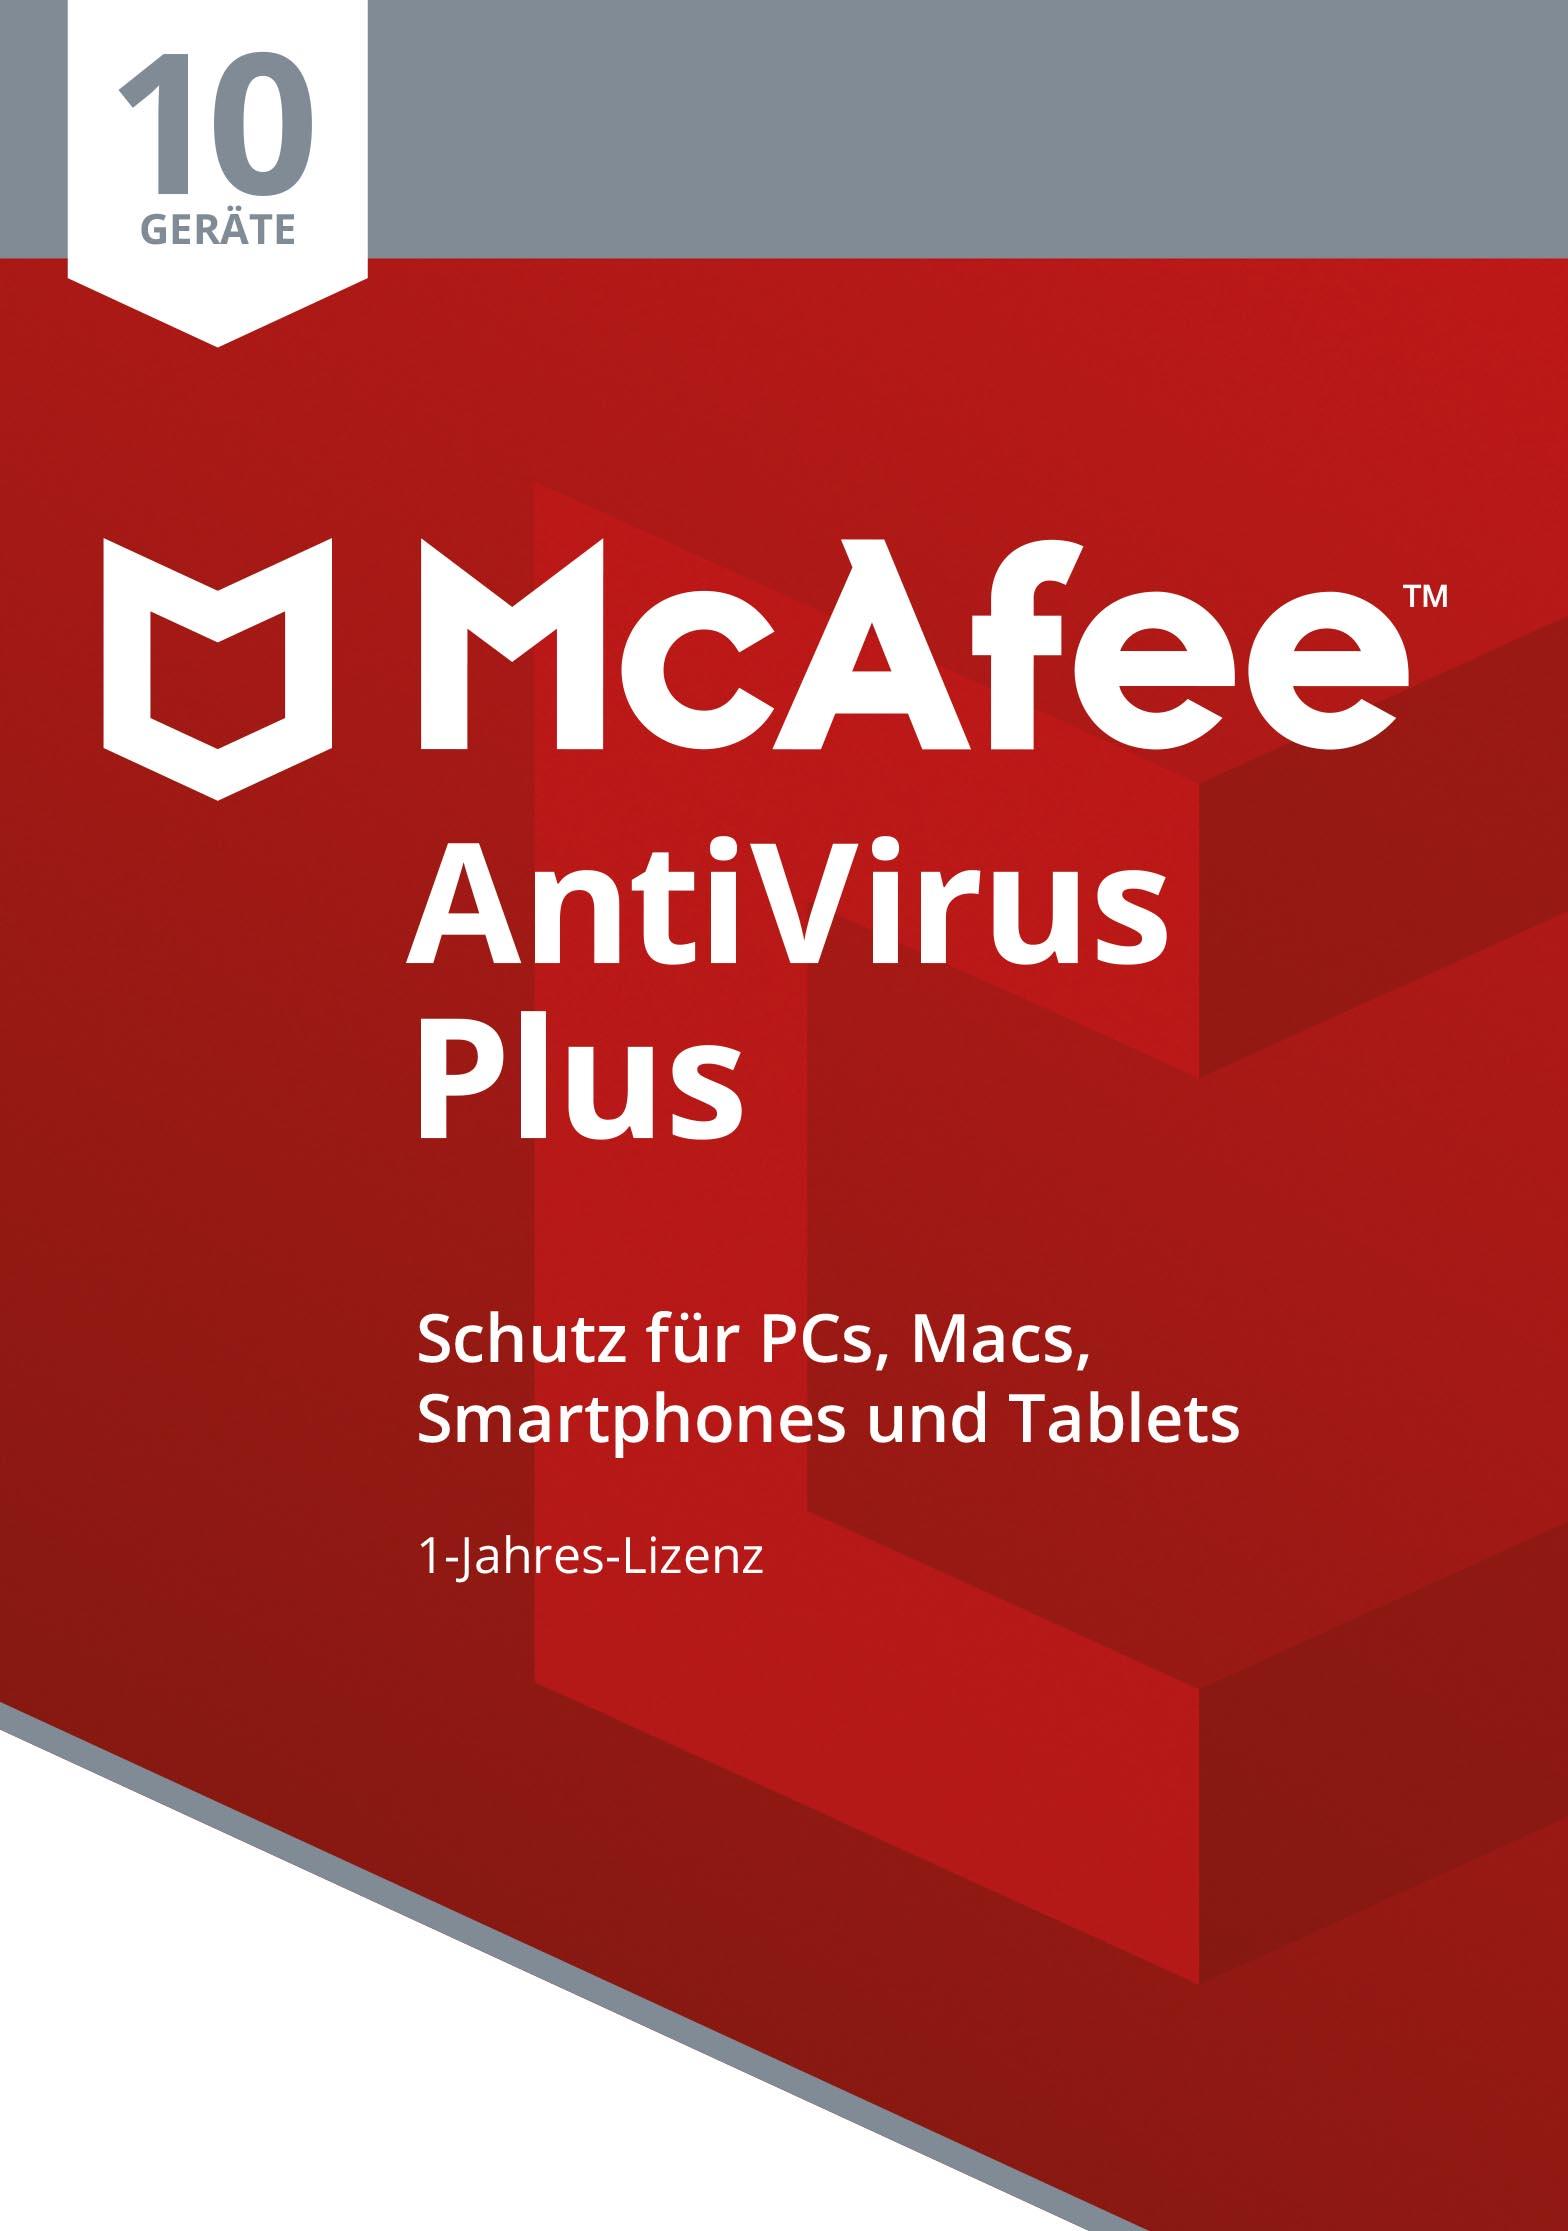 McAfee AntiVirus Plus 2018 | 10 Geräte | 1 Jahr | PC/Mac/Smartphone/Tablet | Online Code